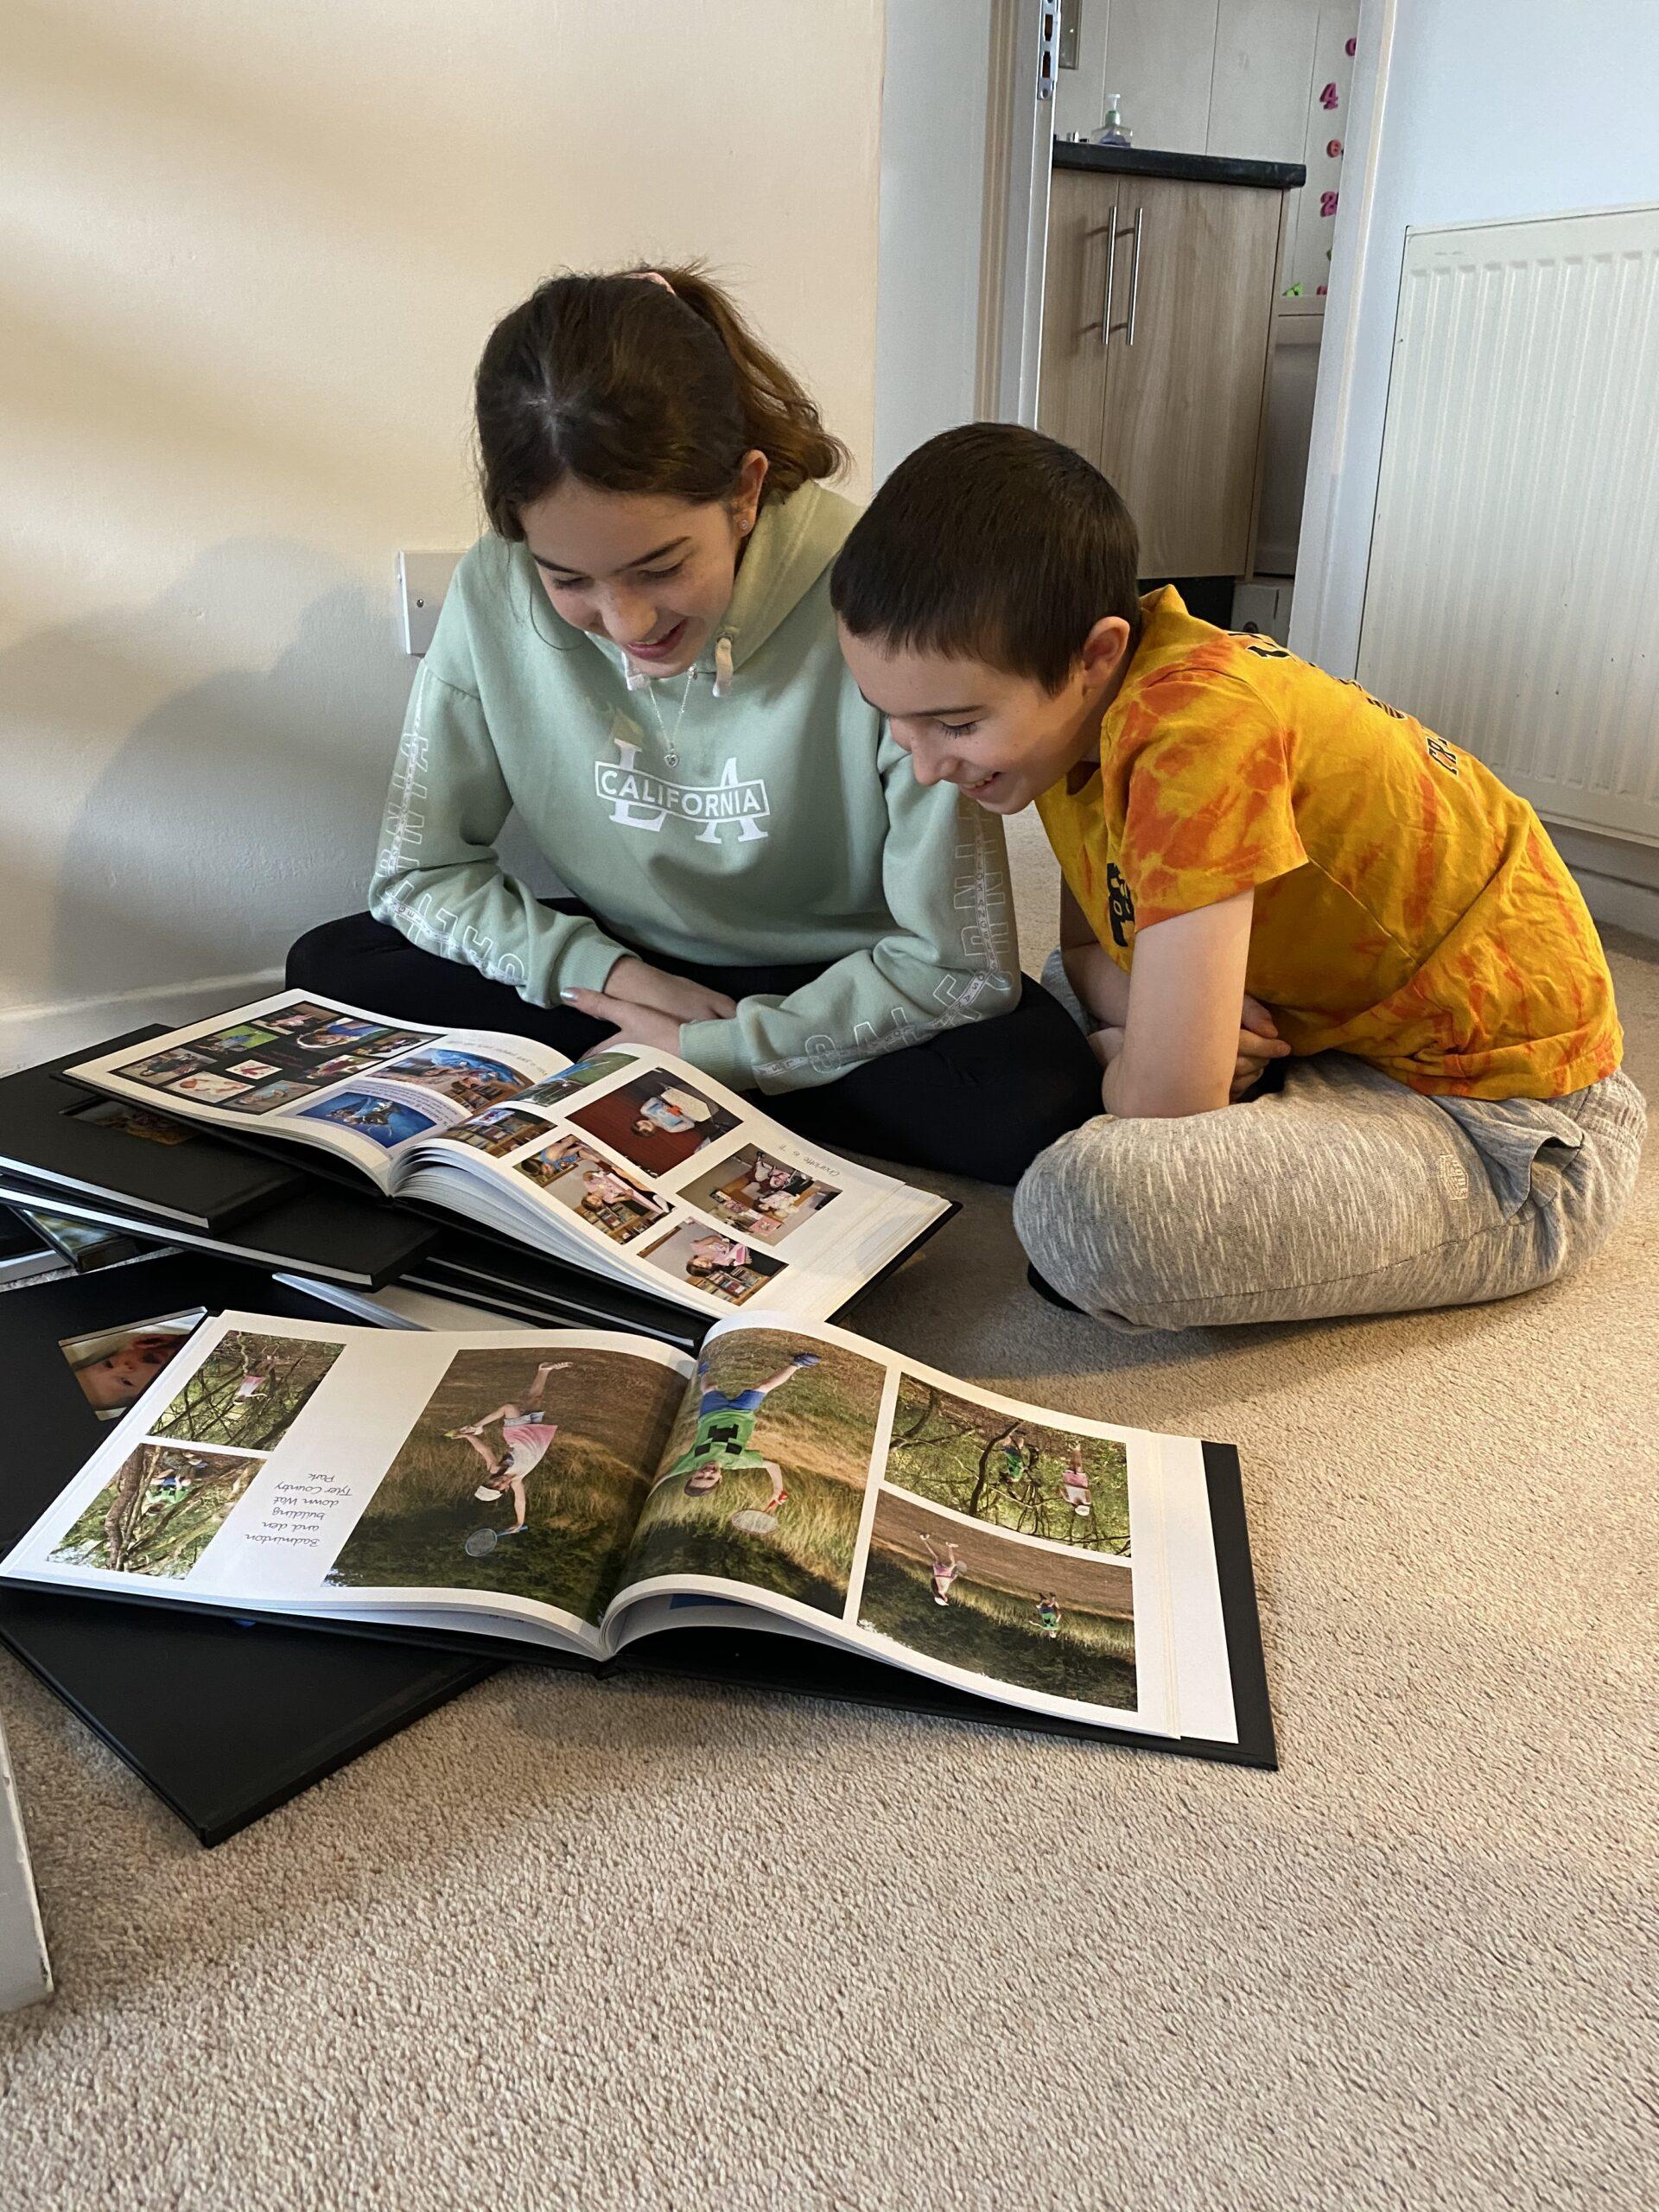 children enjoying photo books